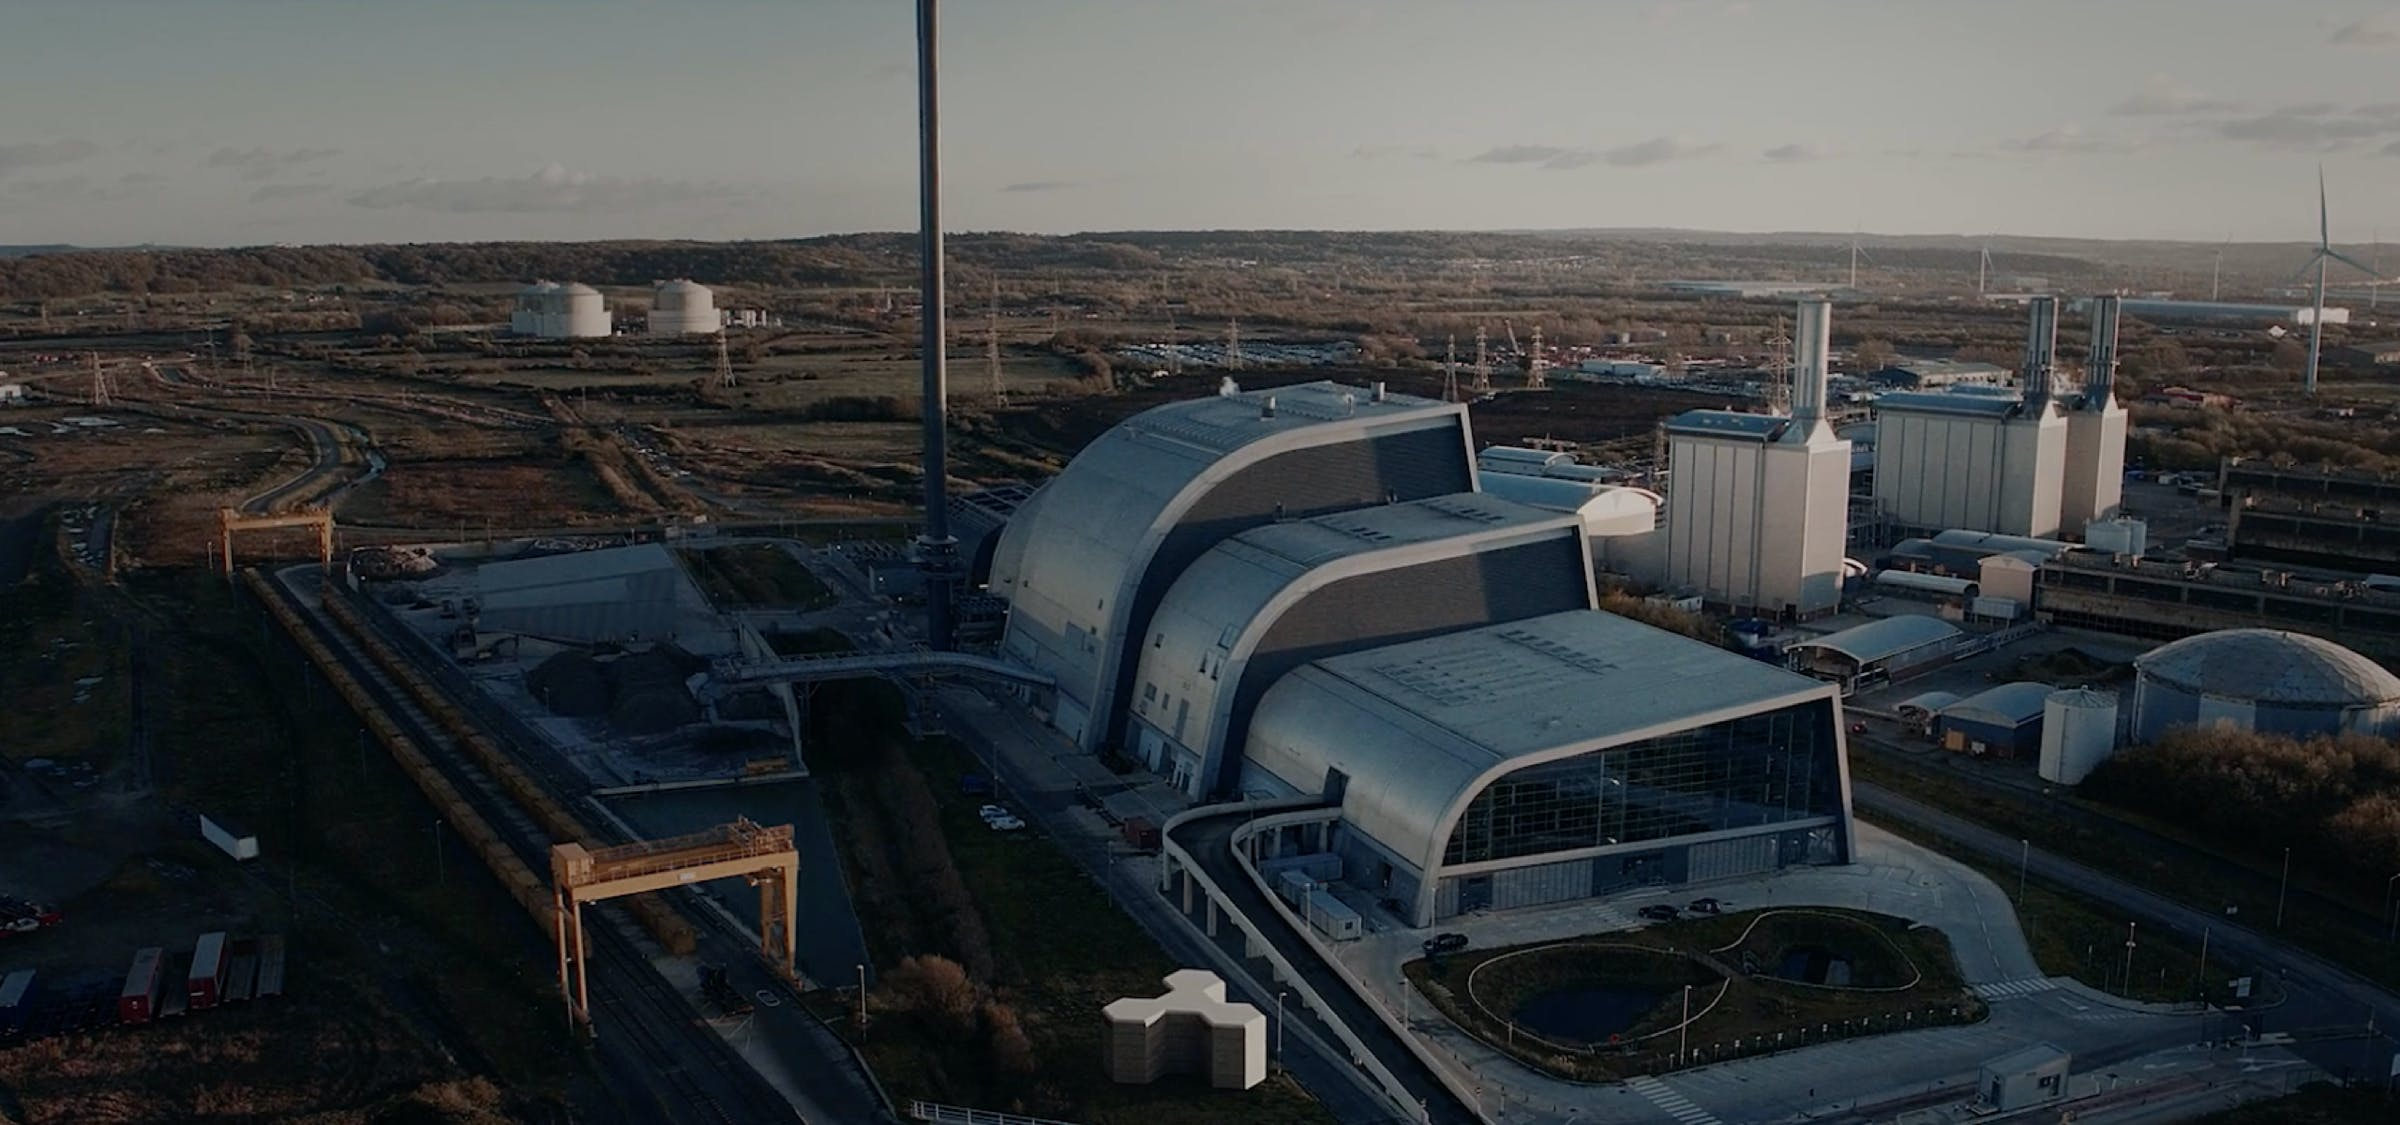 Bulk energy storagefor use in industry.